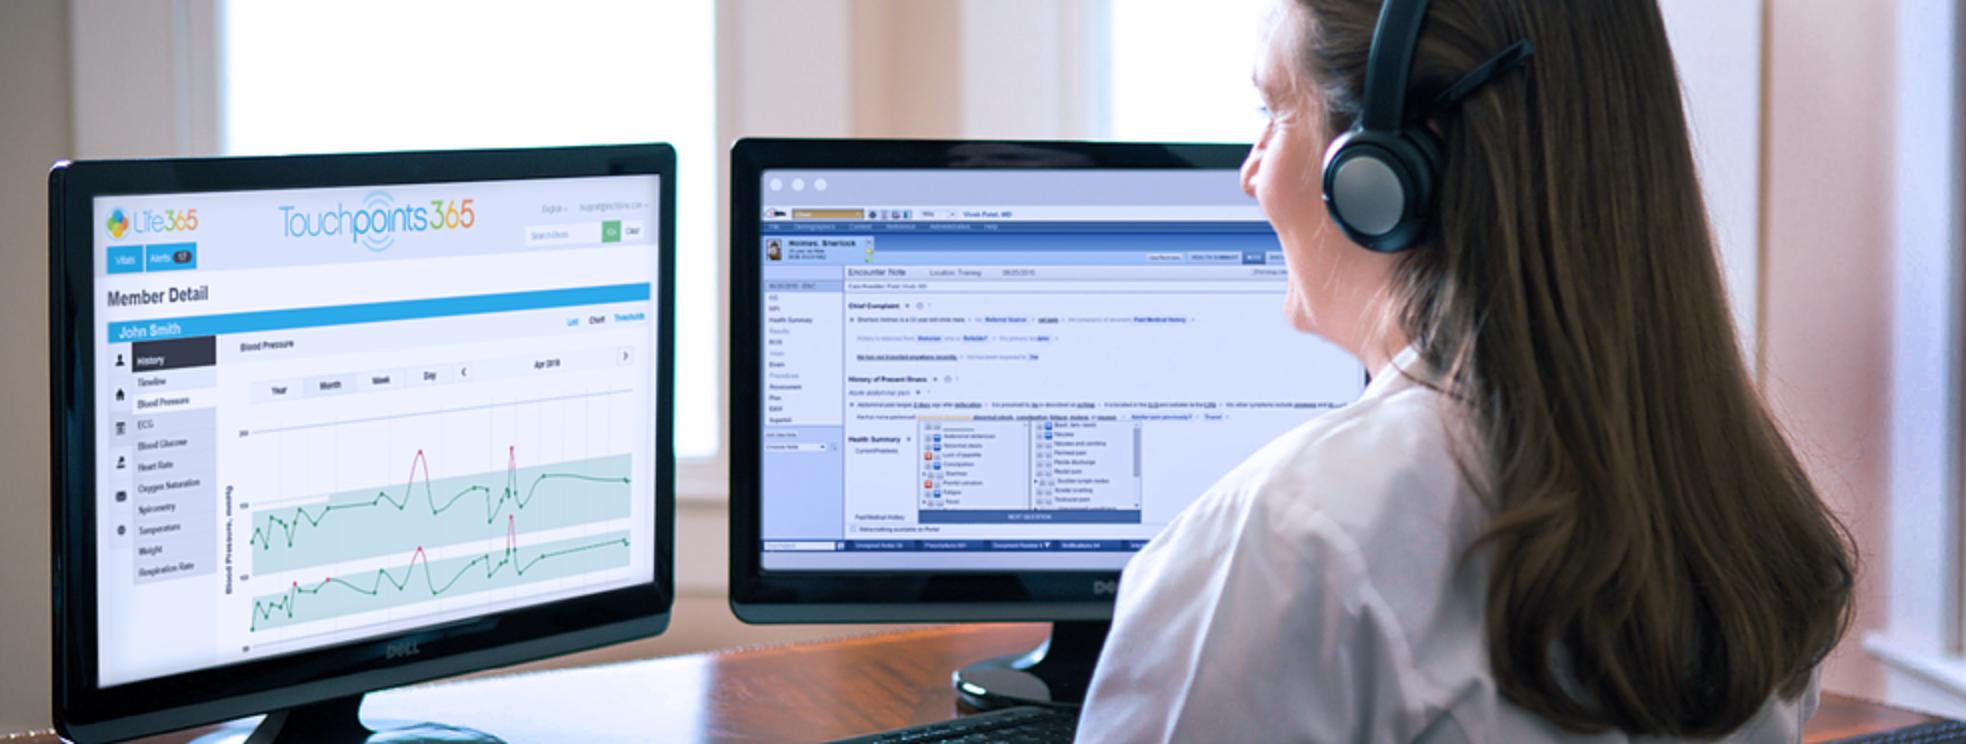 2021 Remote Patient Monitoring Reimbursement Overview